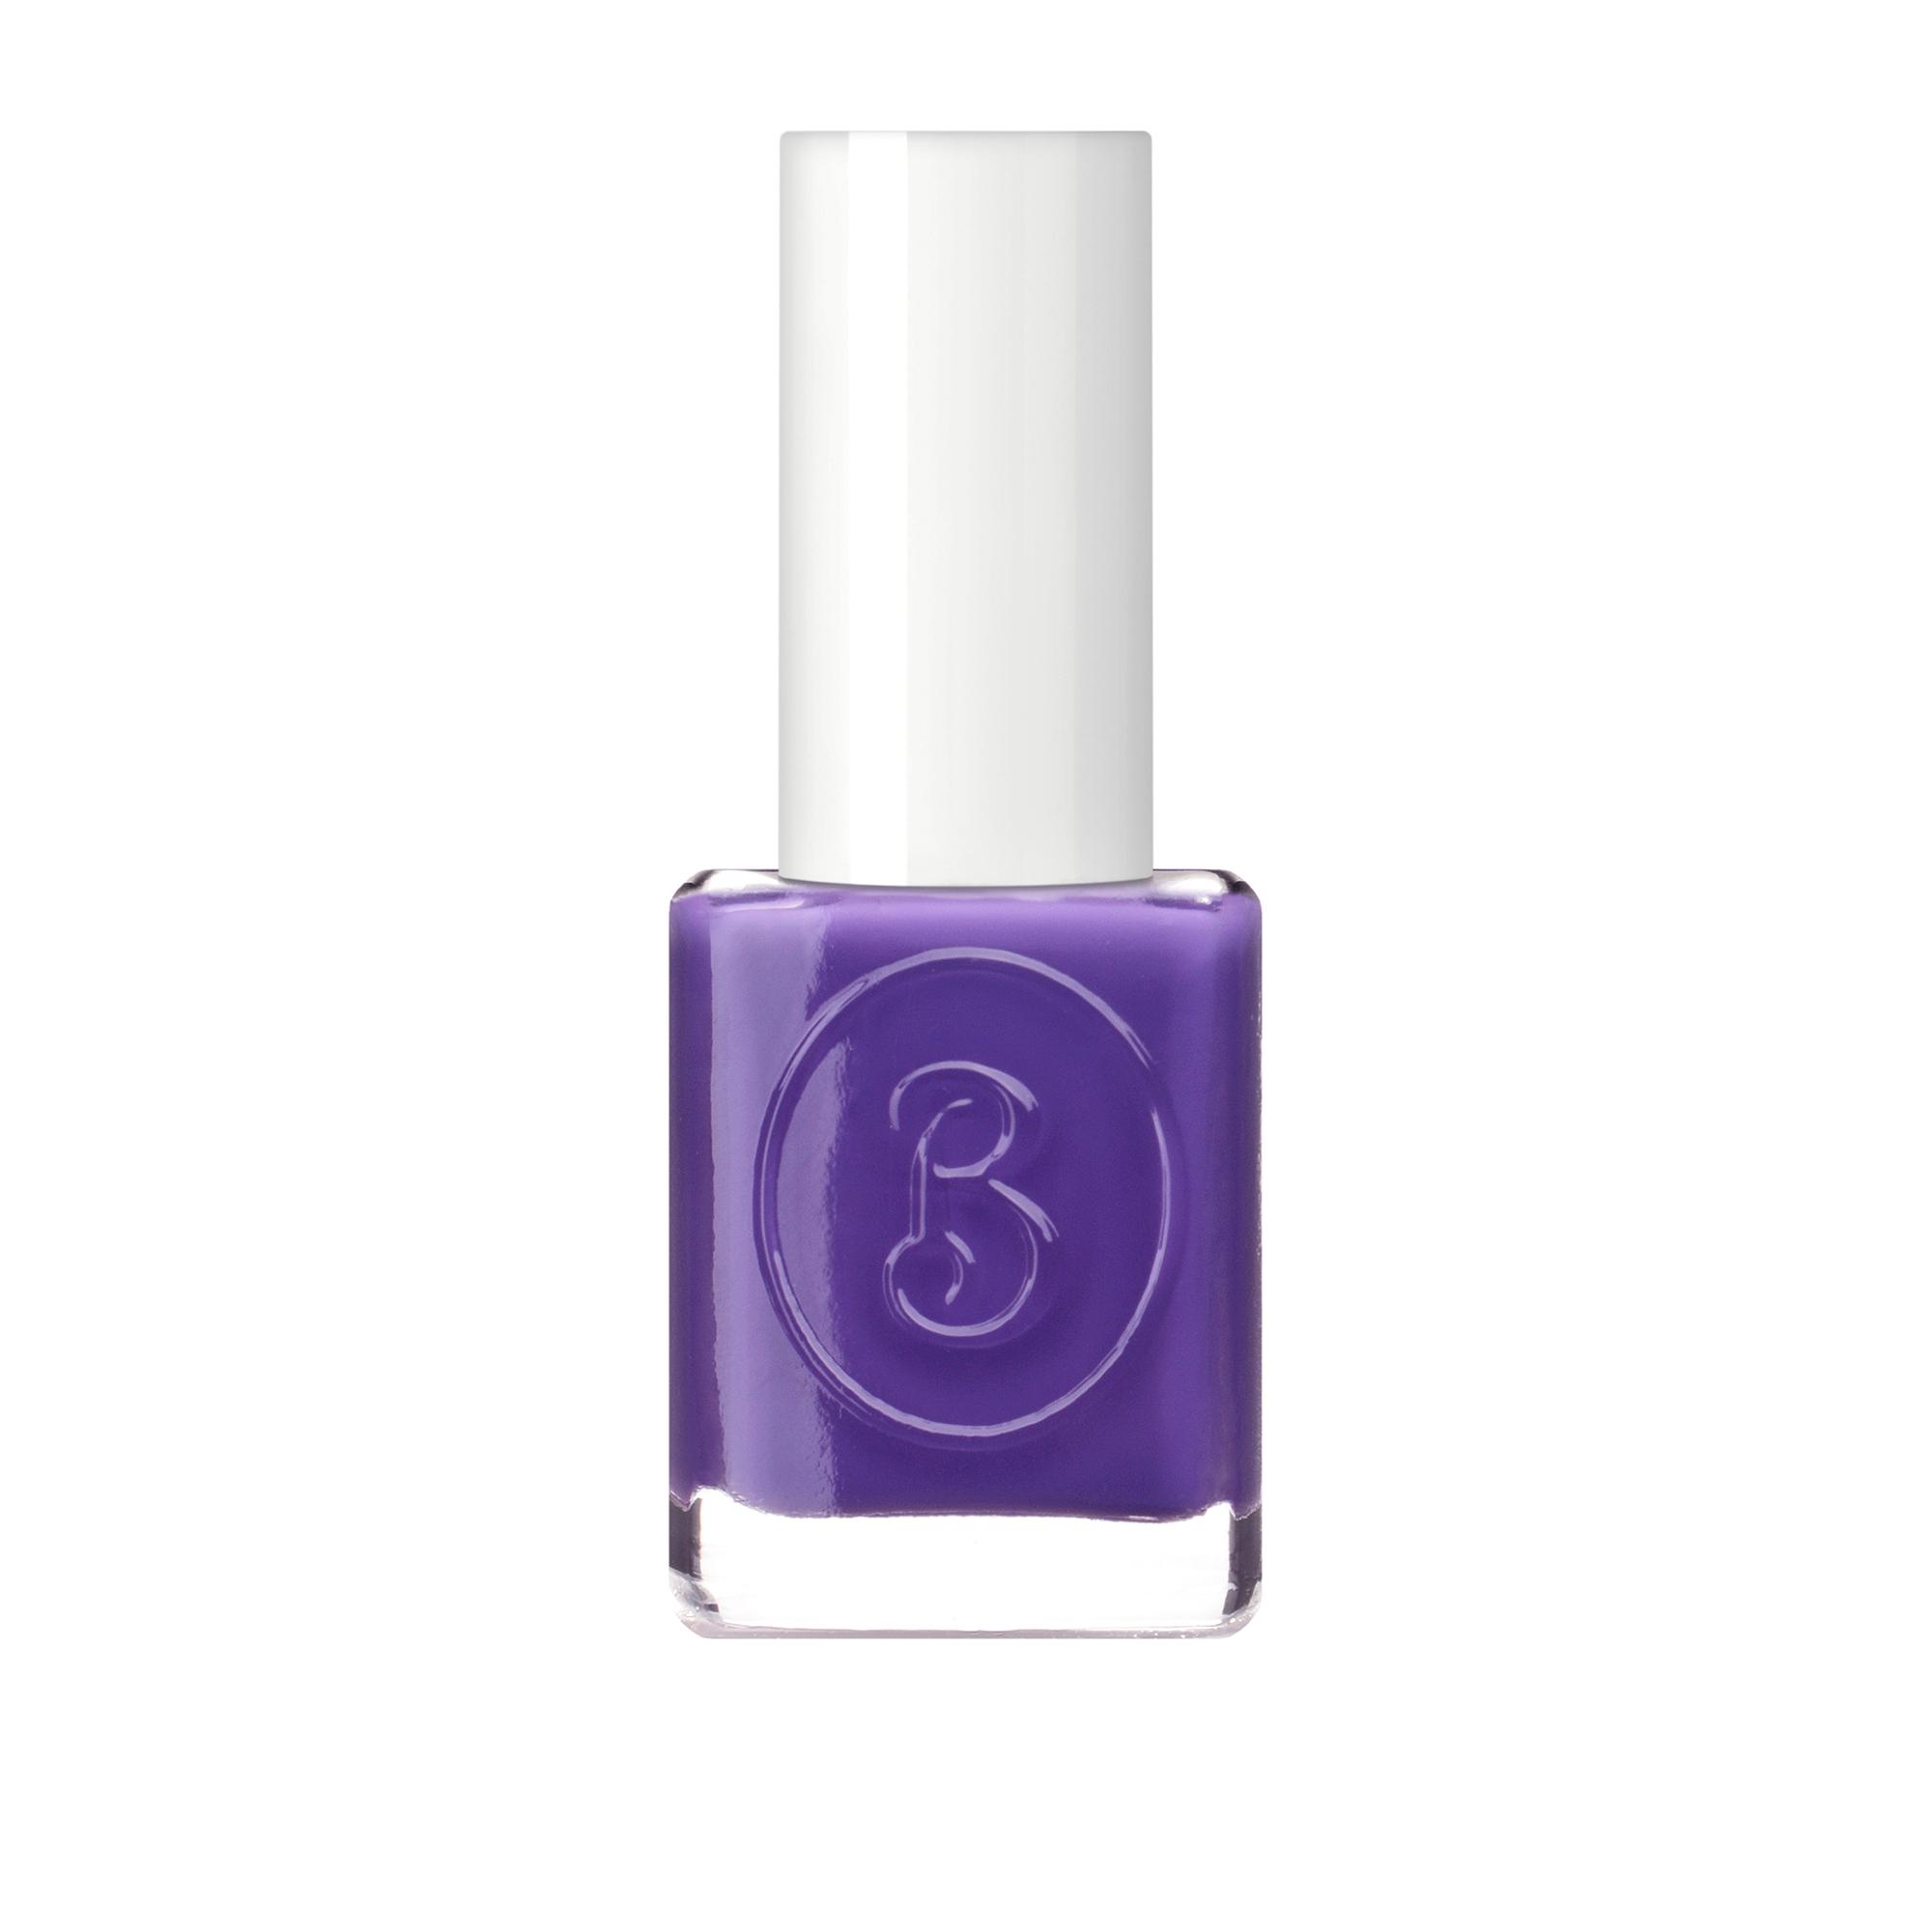 BERENICE Лак для ногтей лавандовое небо тон 52 lavender sky / BERENICE 16 мл